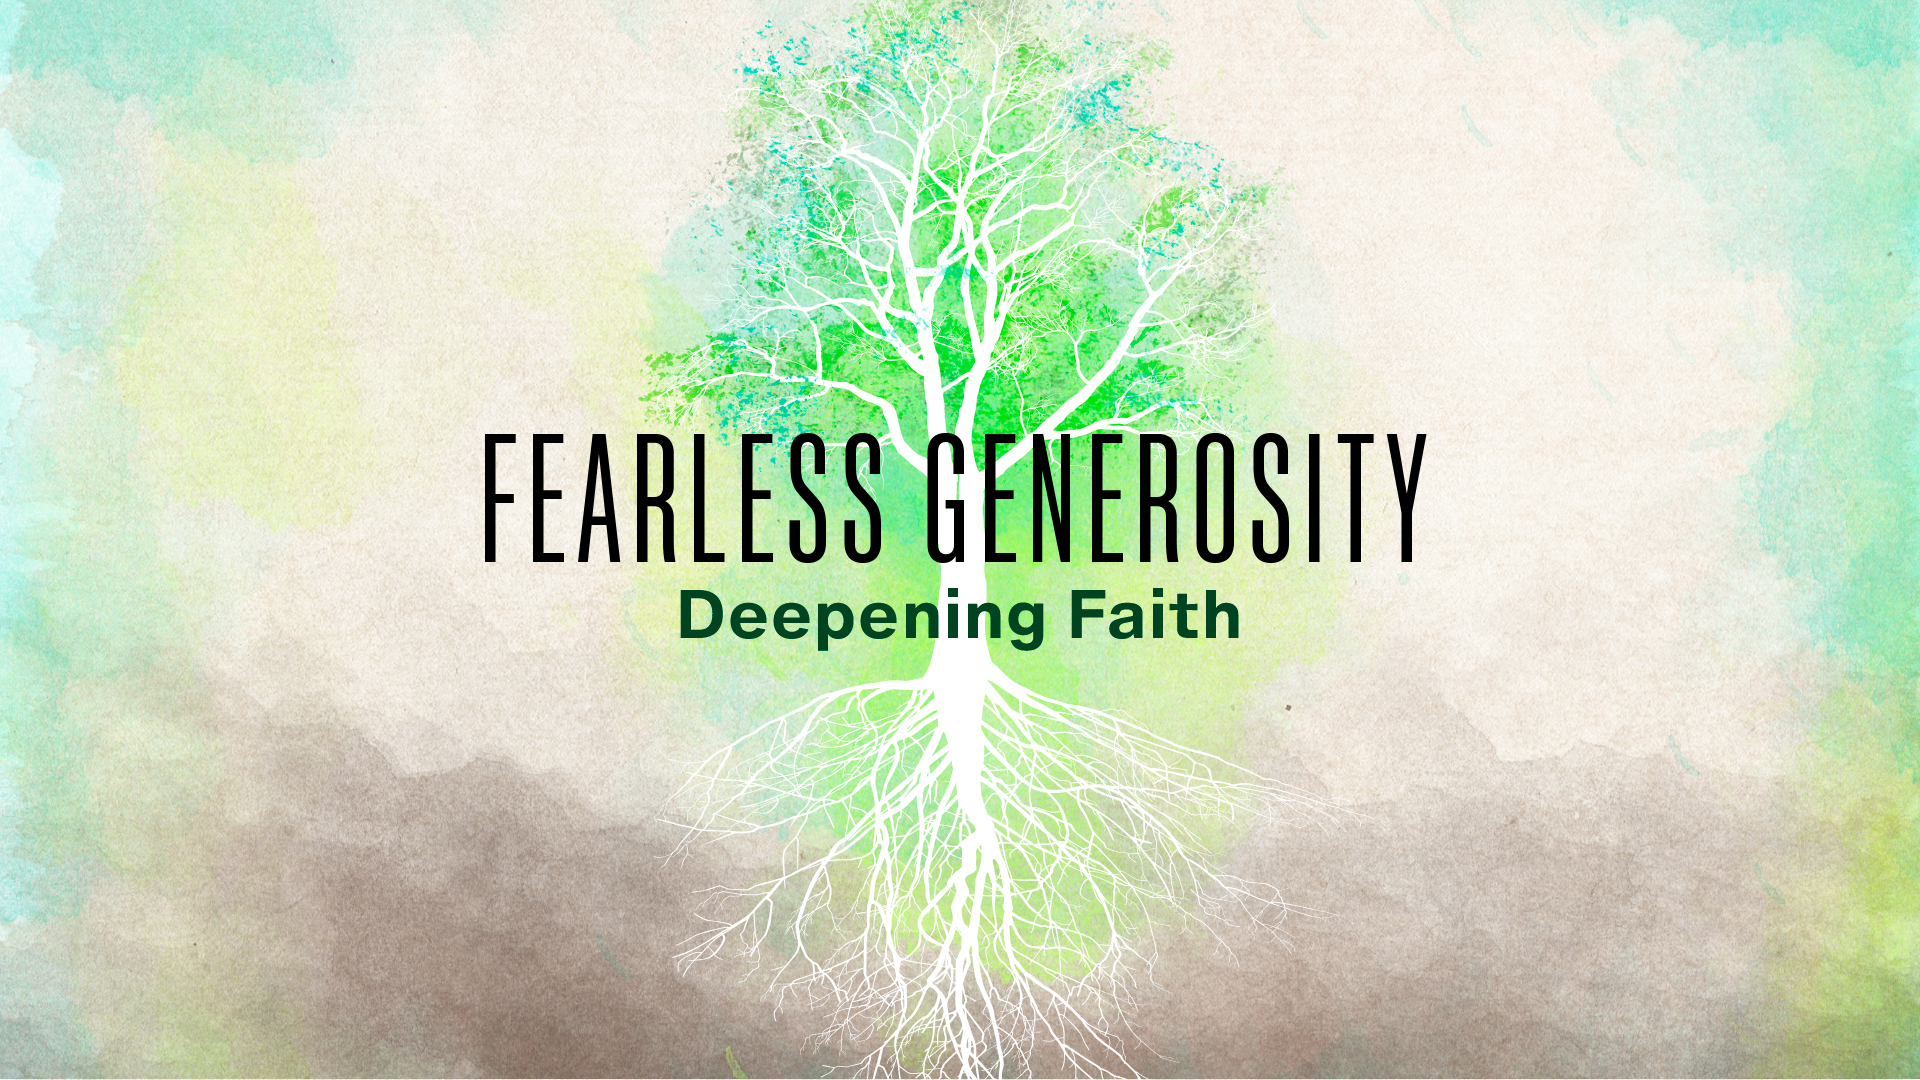 Fearless Generosity: Deepening Faith